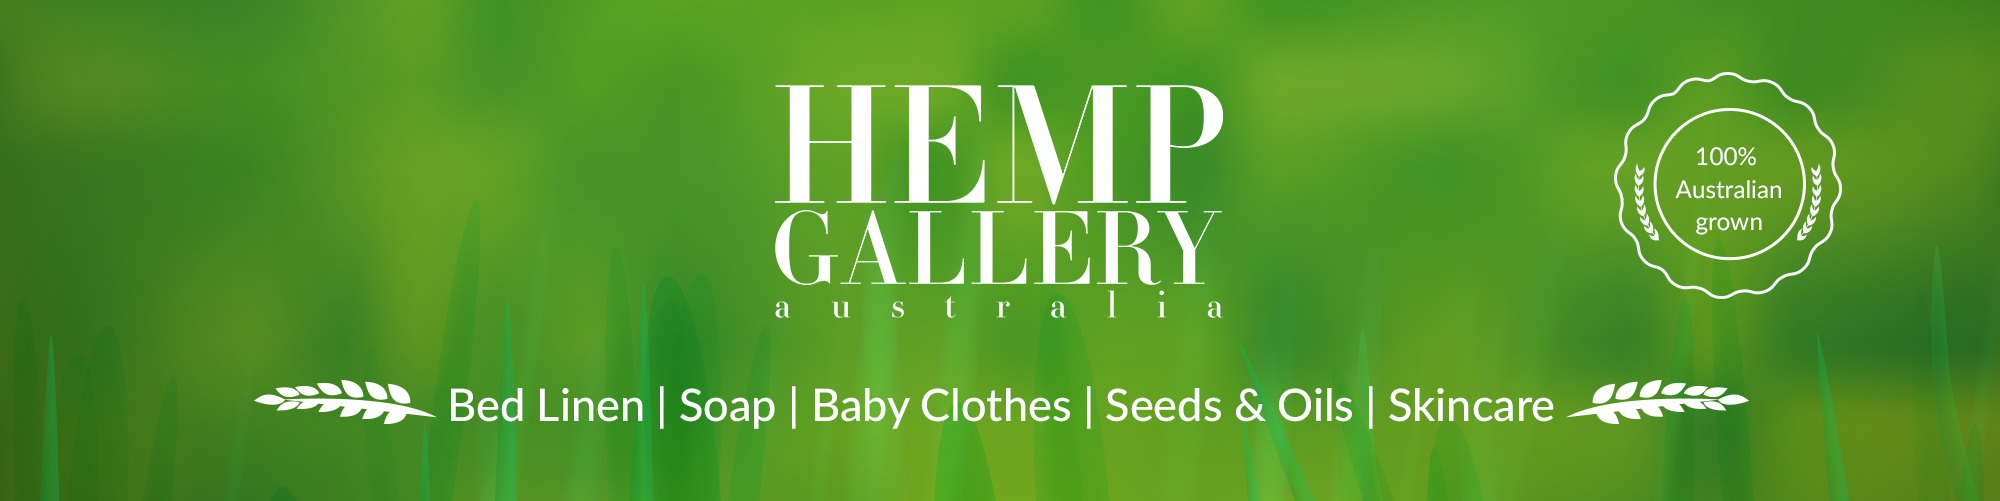 Hemp Gallery